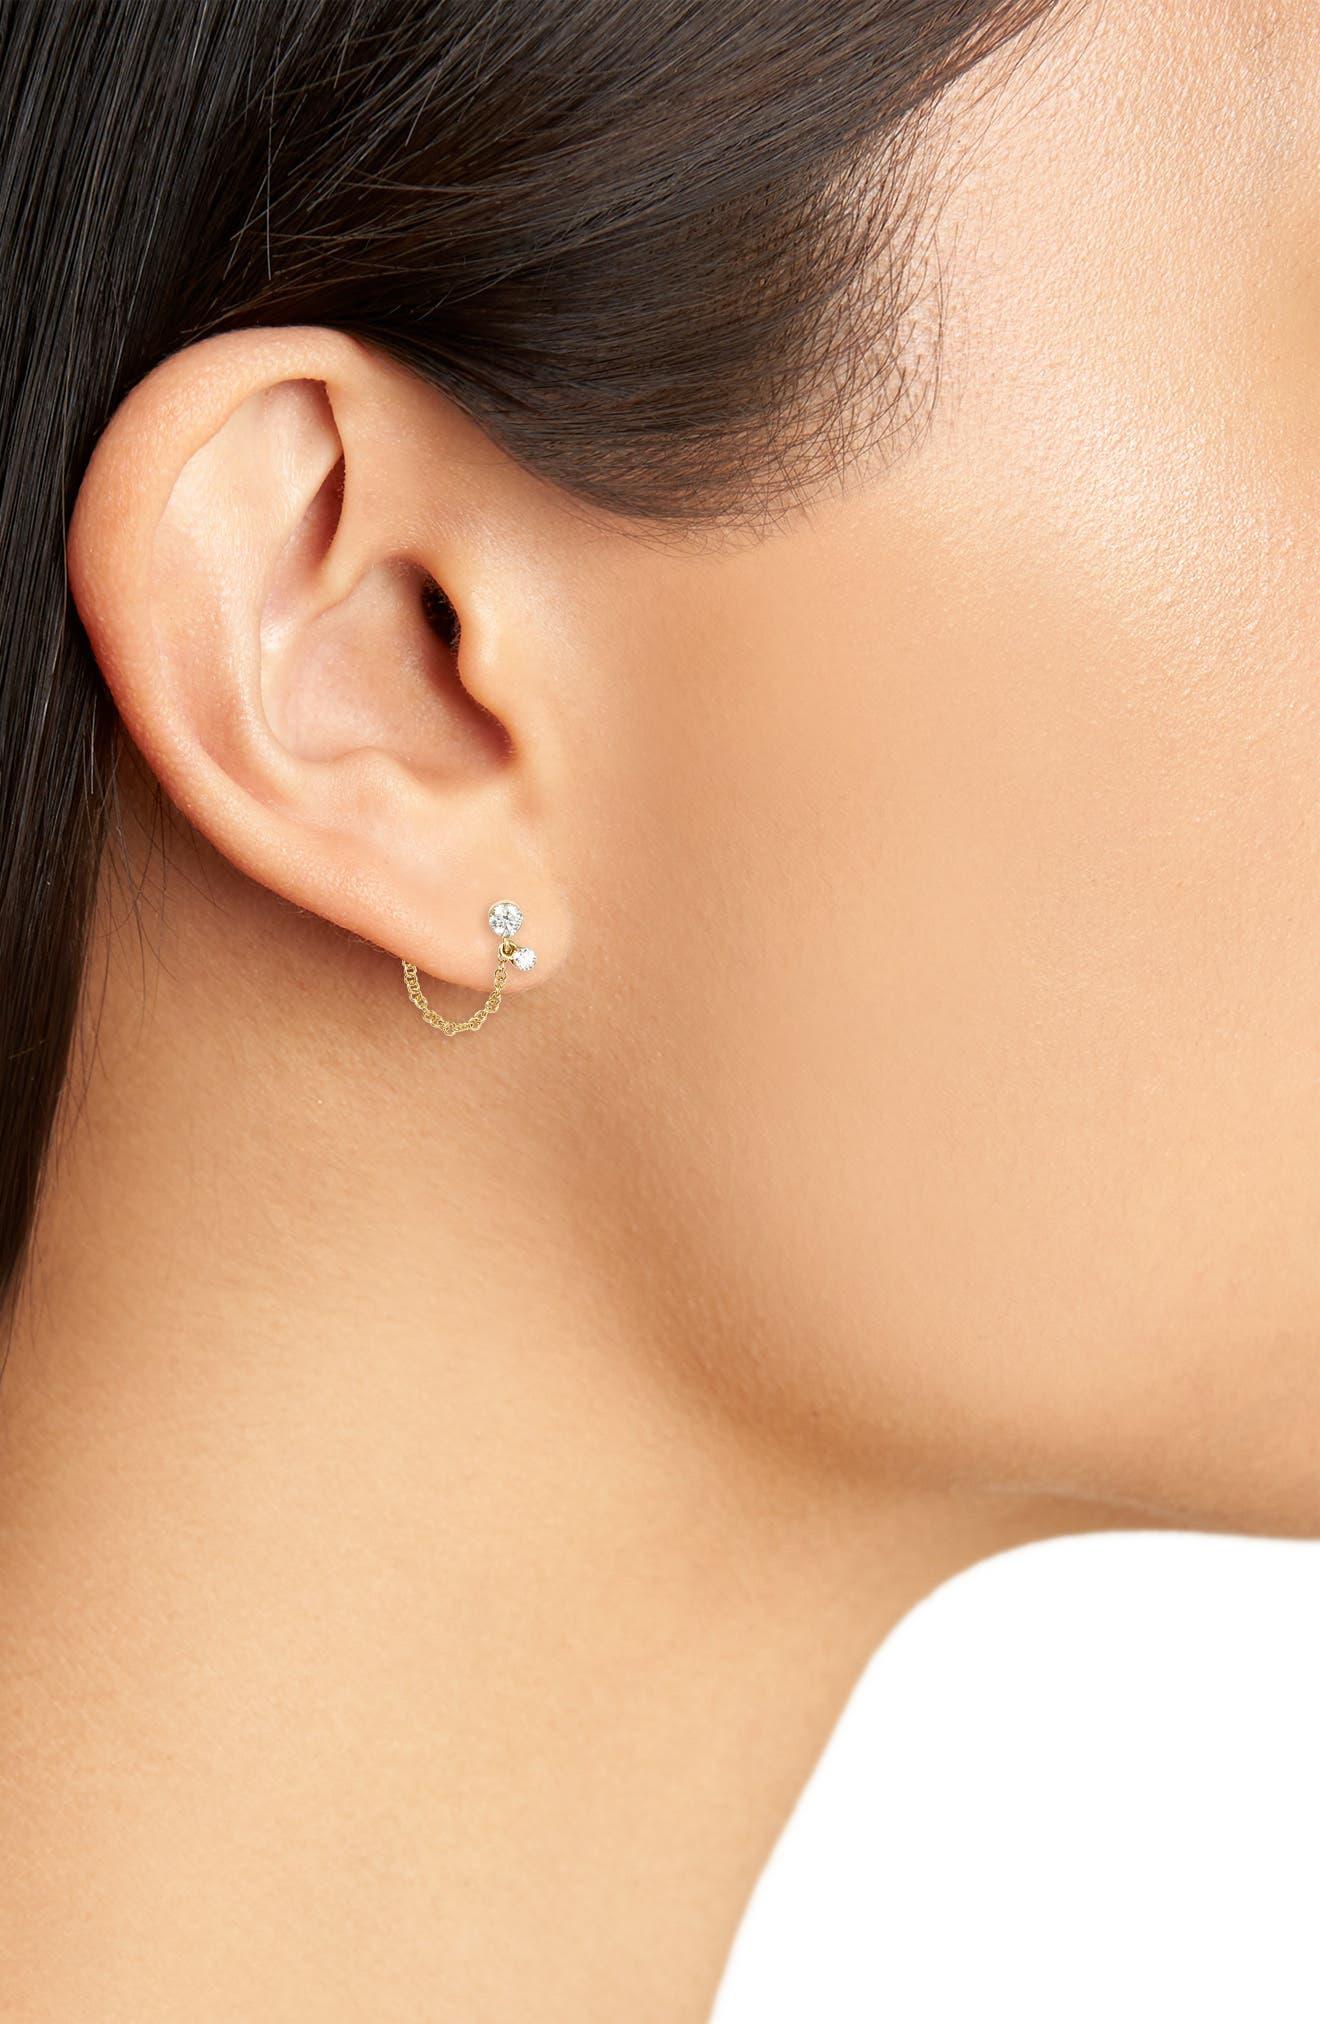 Invisibly Set Diamond Dangle & Chain Stud Earring,                             Alternate thumbnail 2, color,                             710